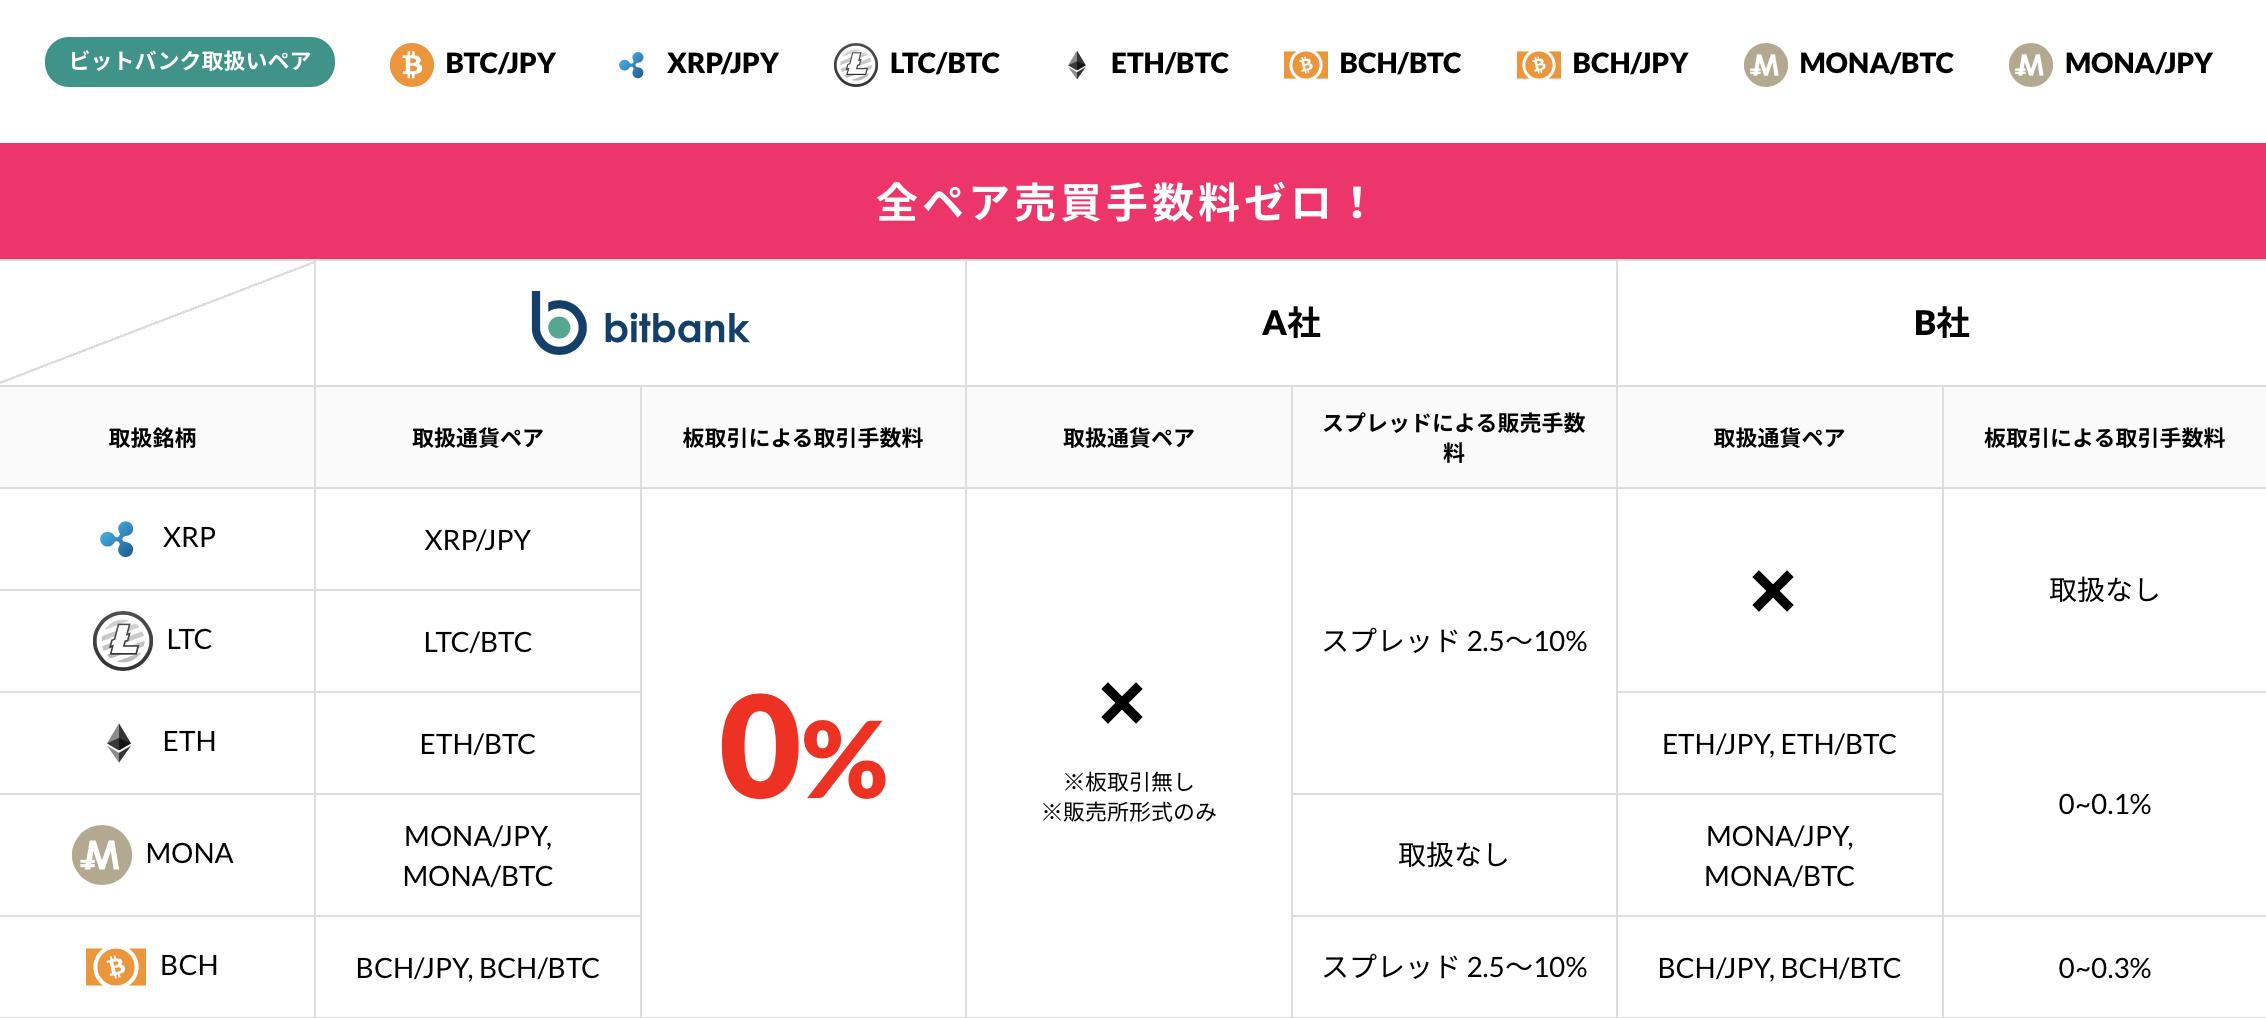 bitbank(ビットバンク)のHP